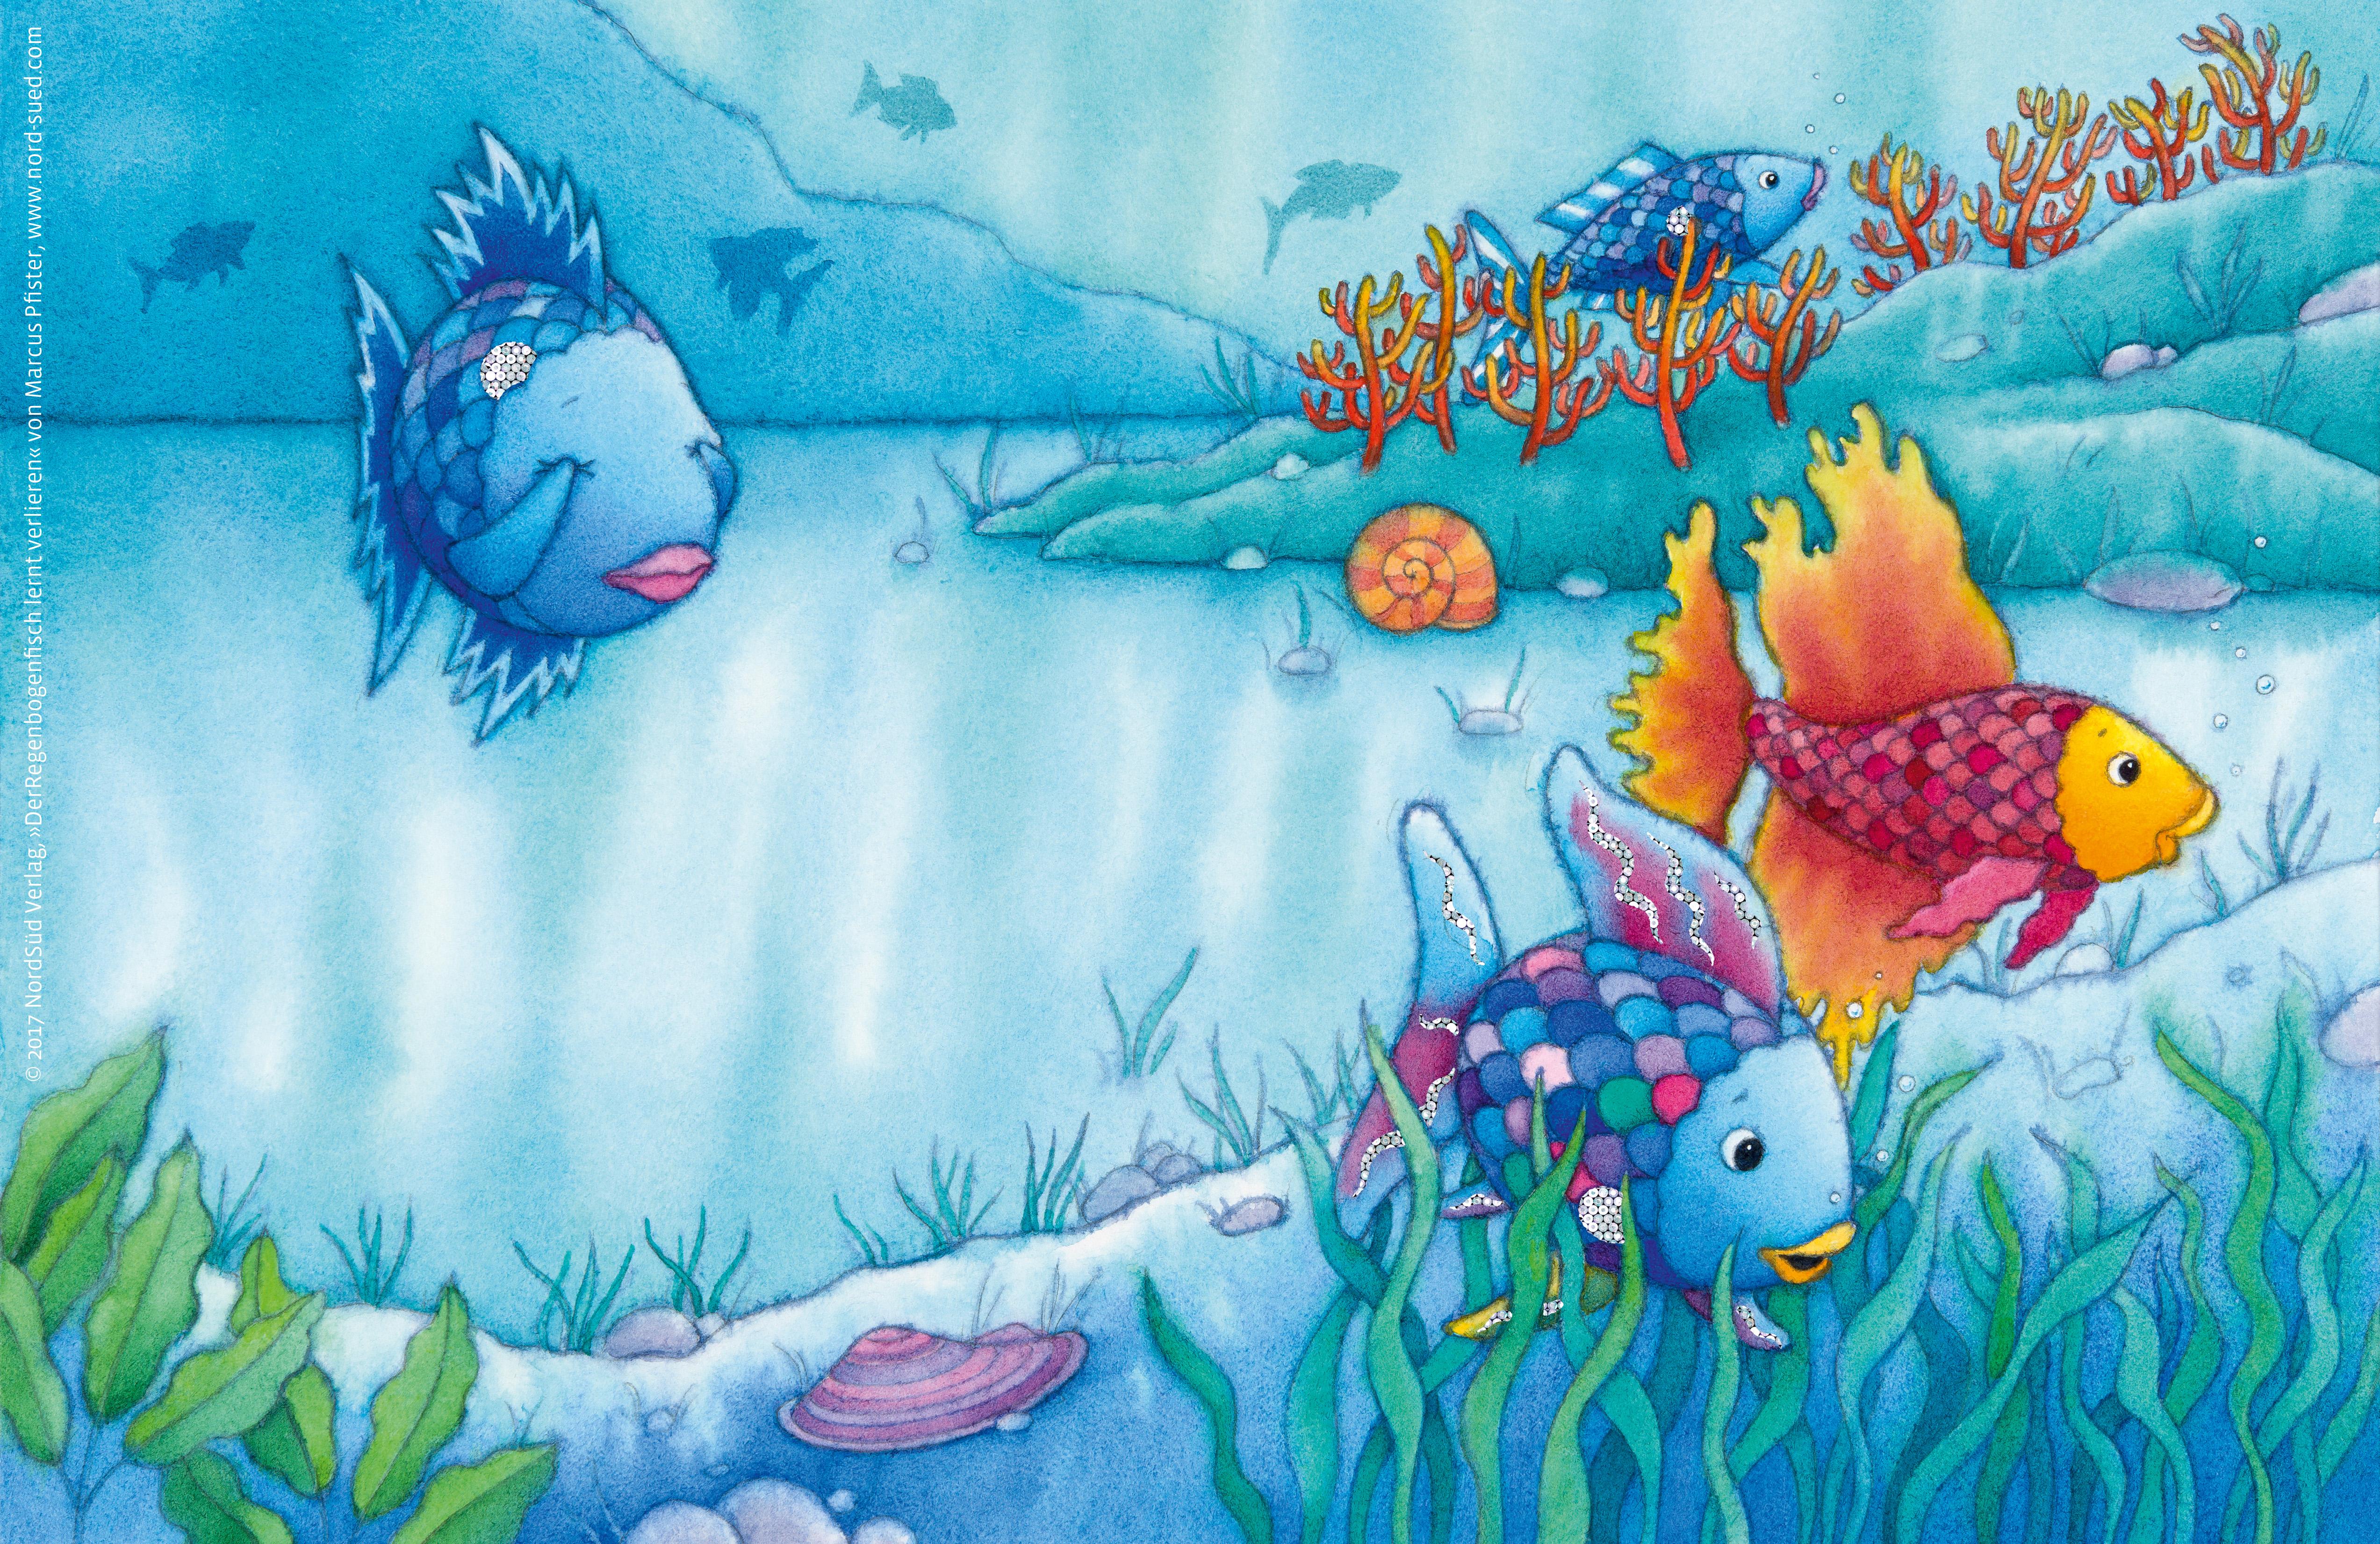 Wallpaper - Der Regenbogenfisch